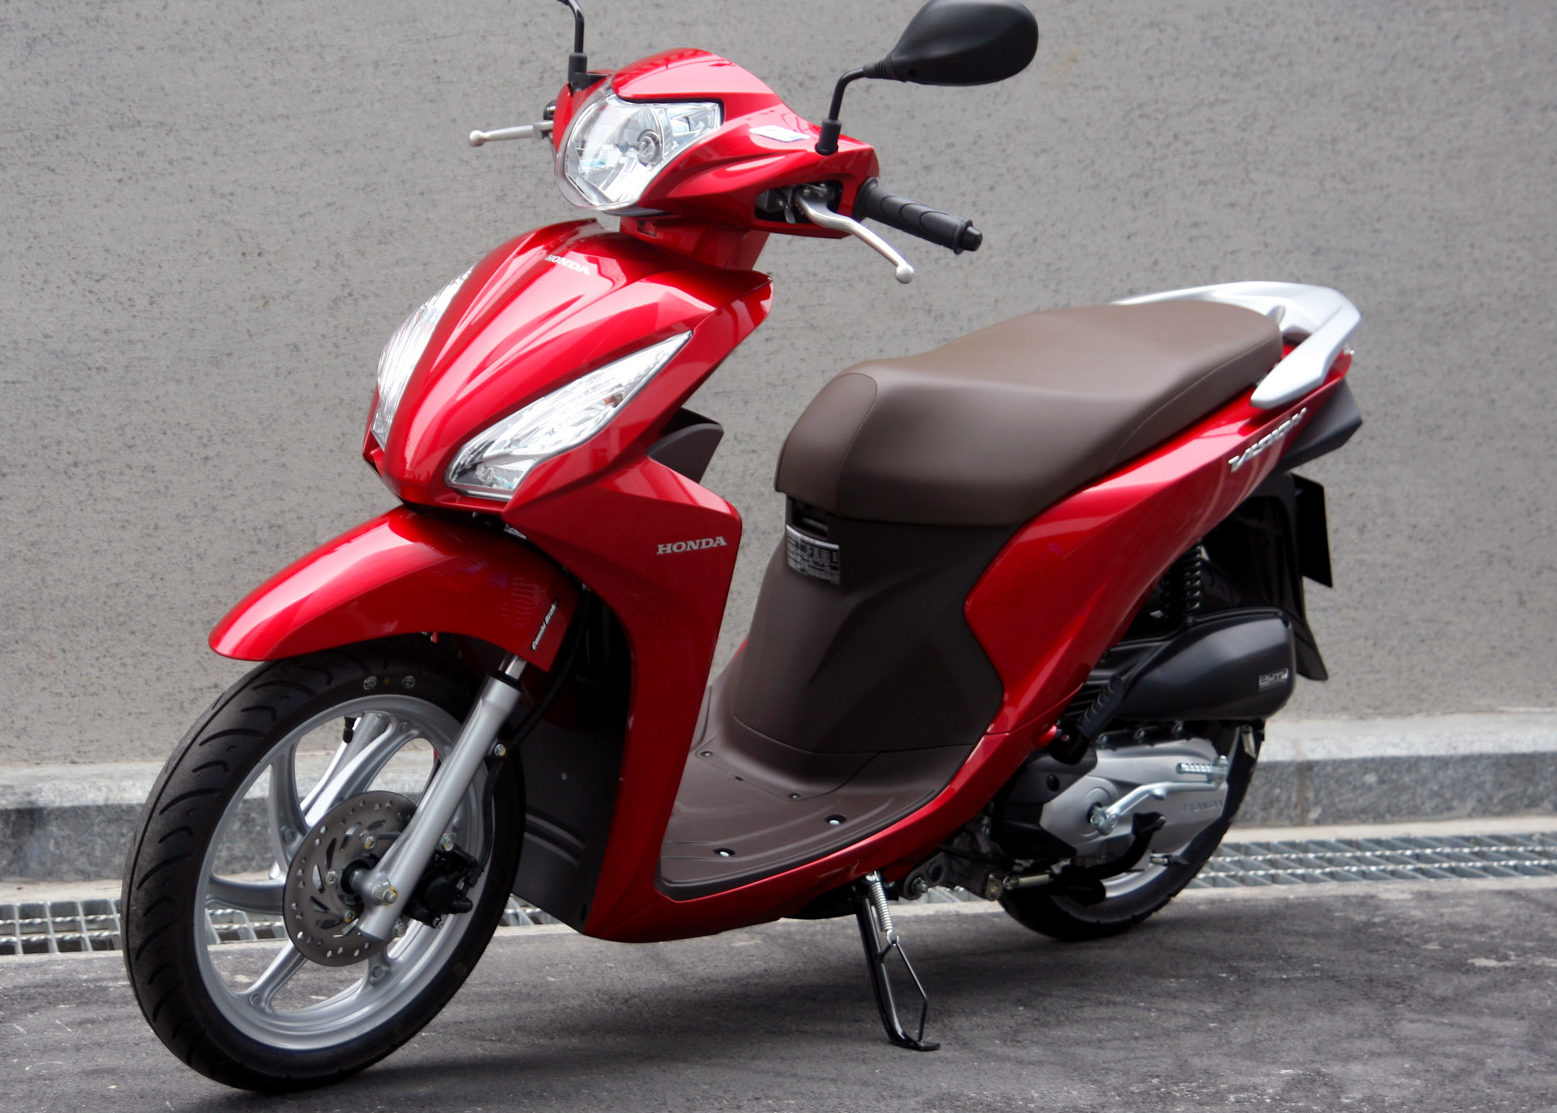 Nên chọn mua xe suzuki address honda vission hay yamaha nozza - 3